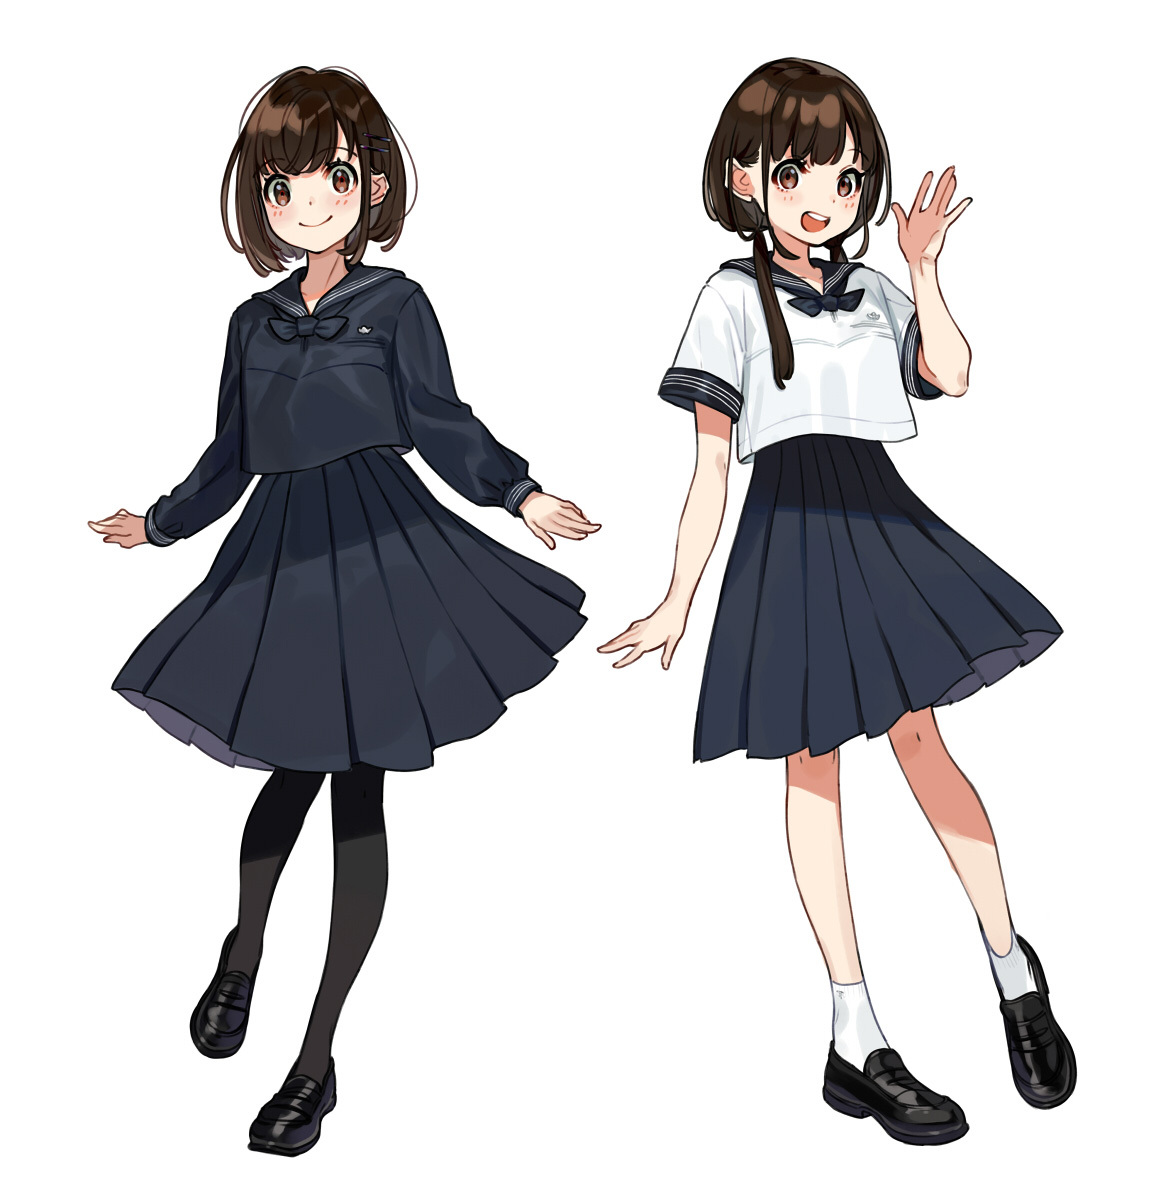 [Pixiv精选]你更爱哪款?黑VS白水手服插画特辑